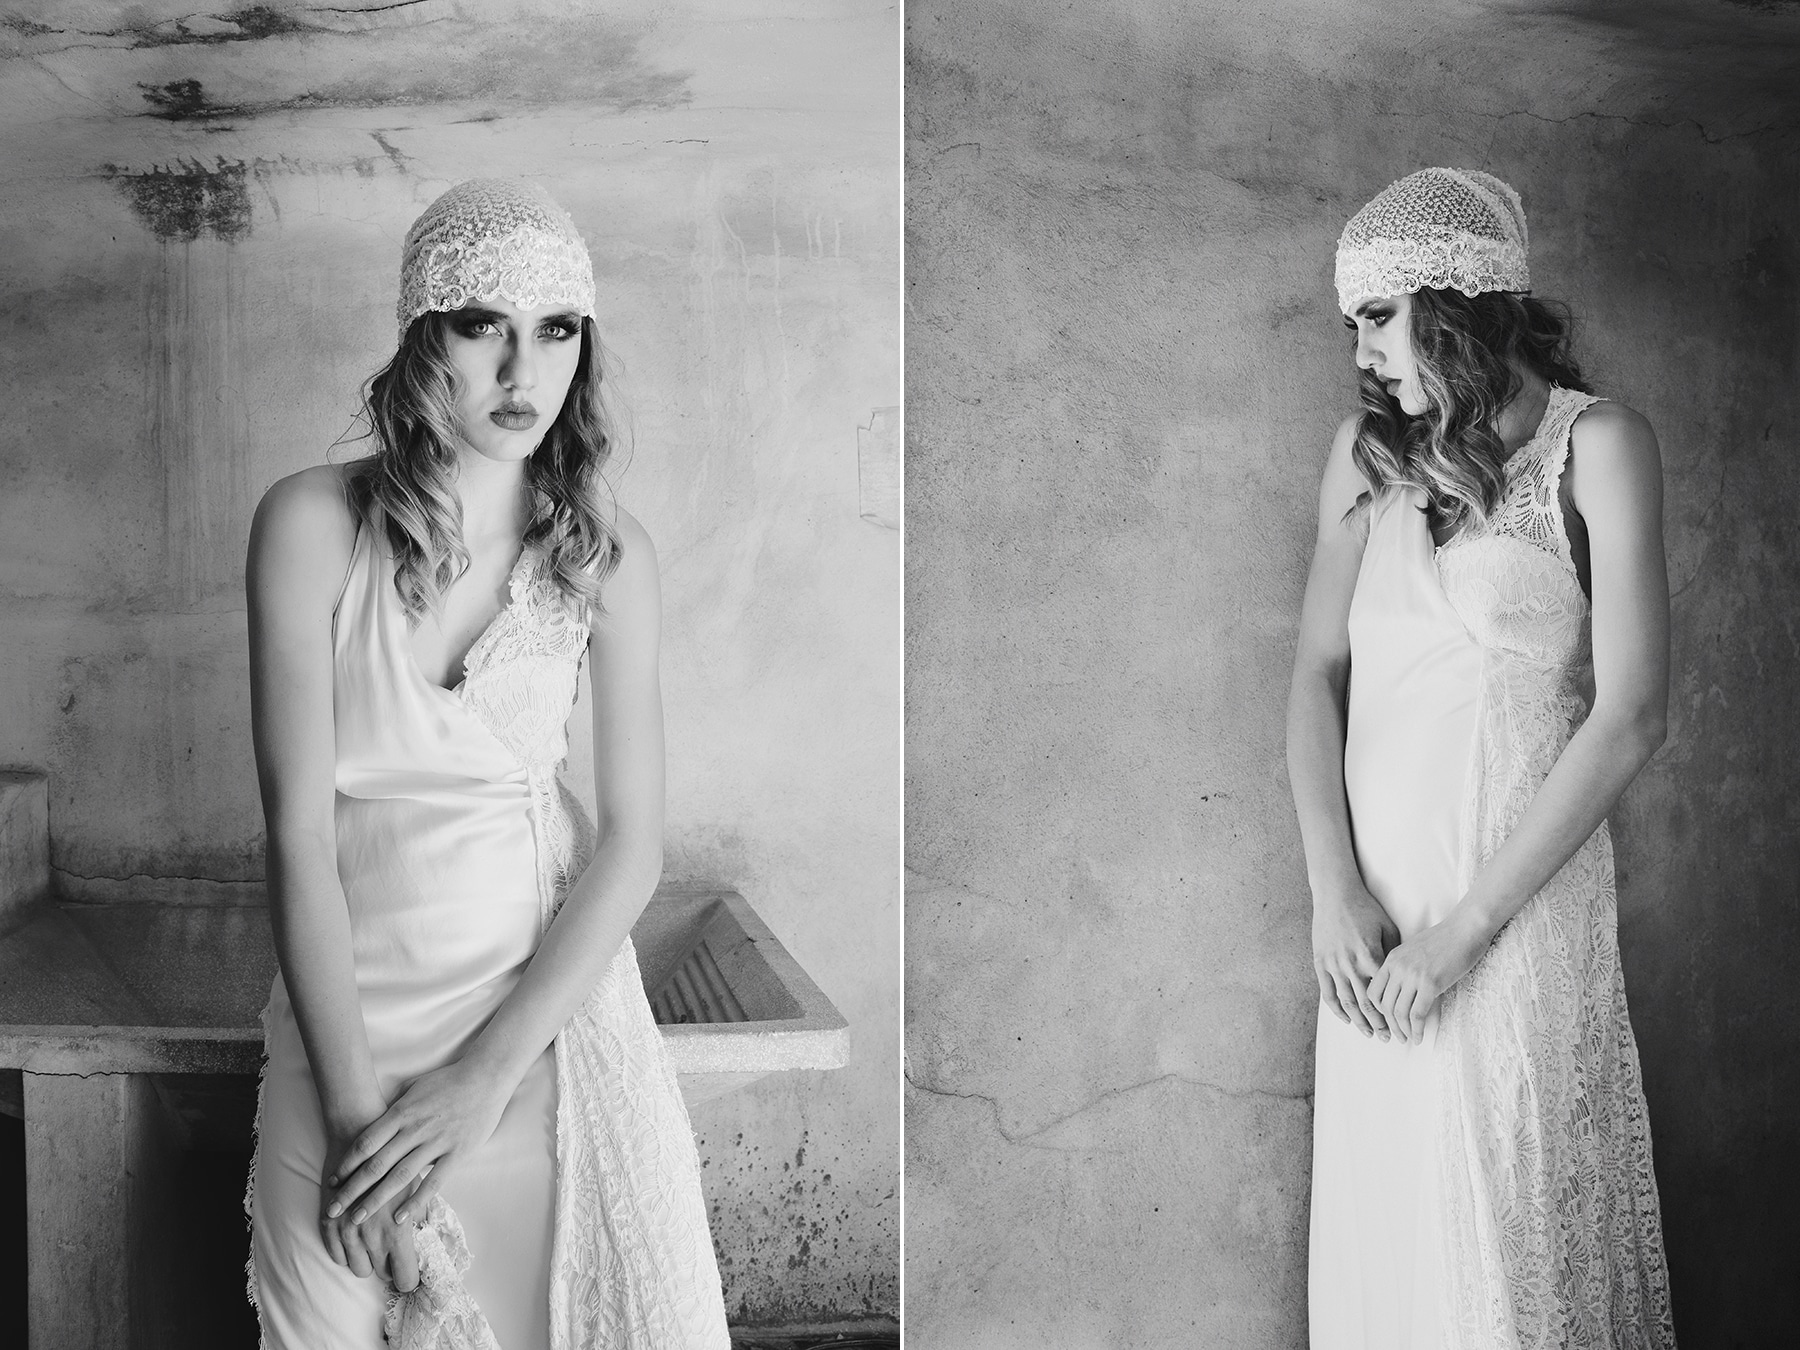 20s styled φωτογράφιση με νυφικά!